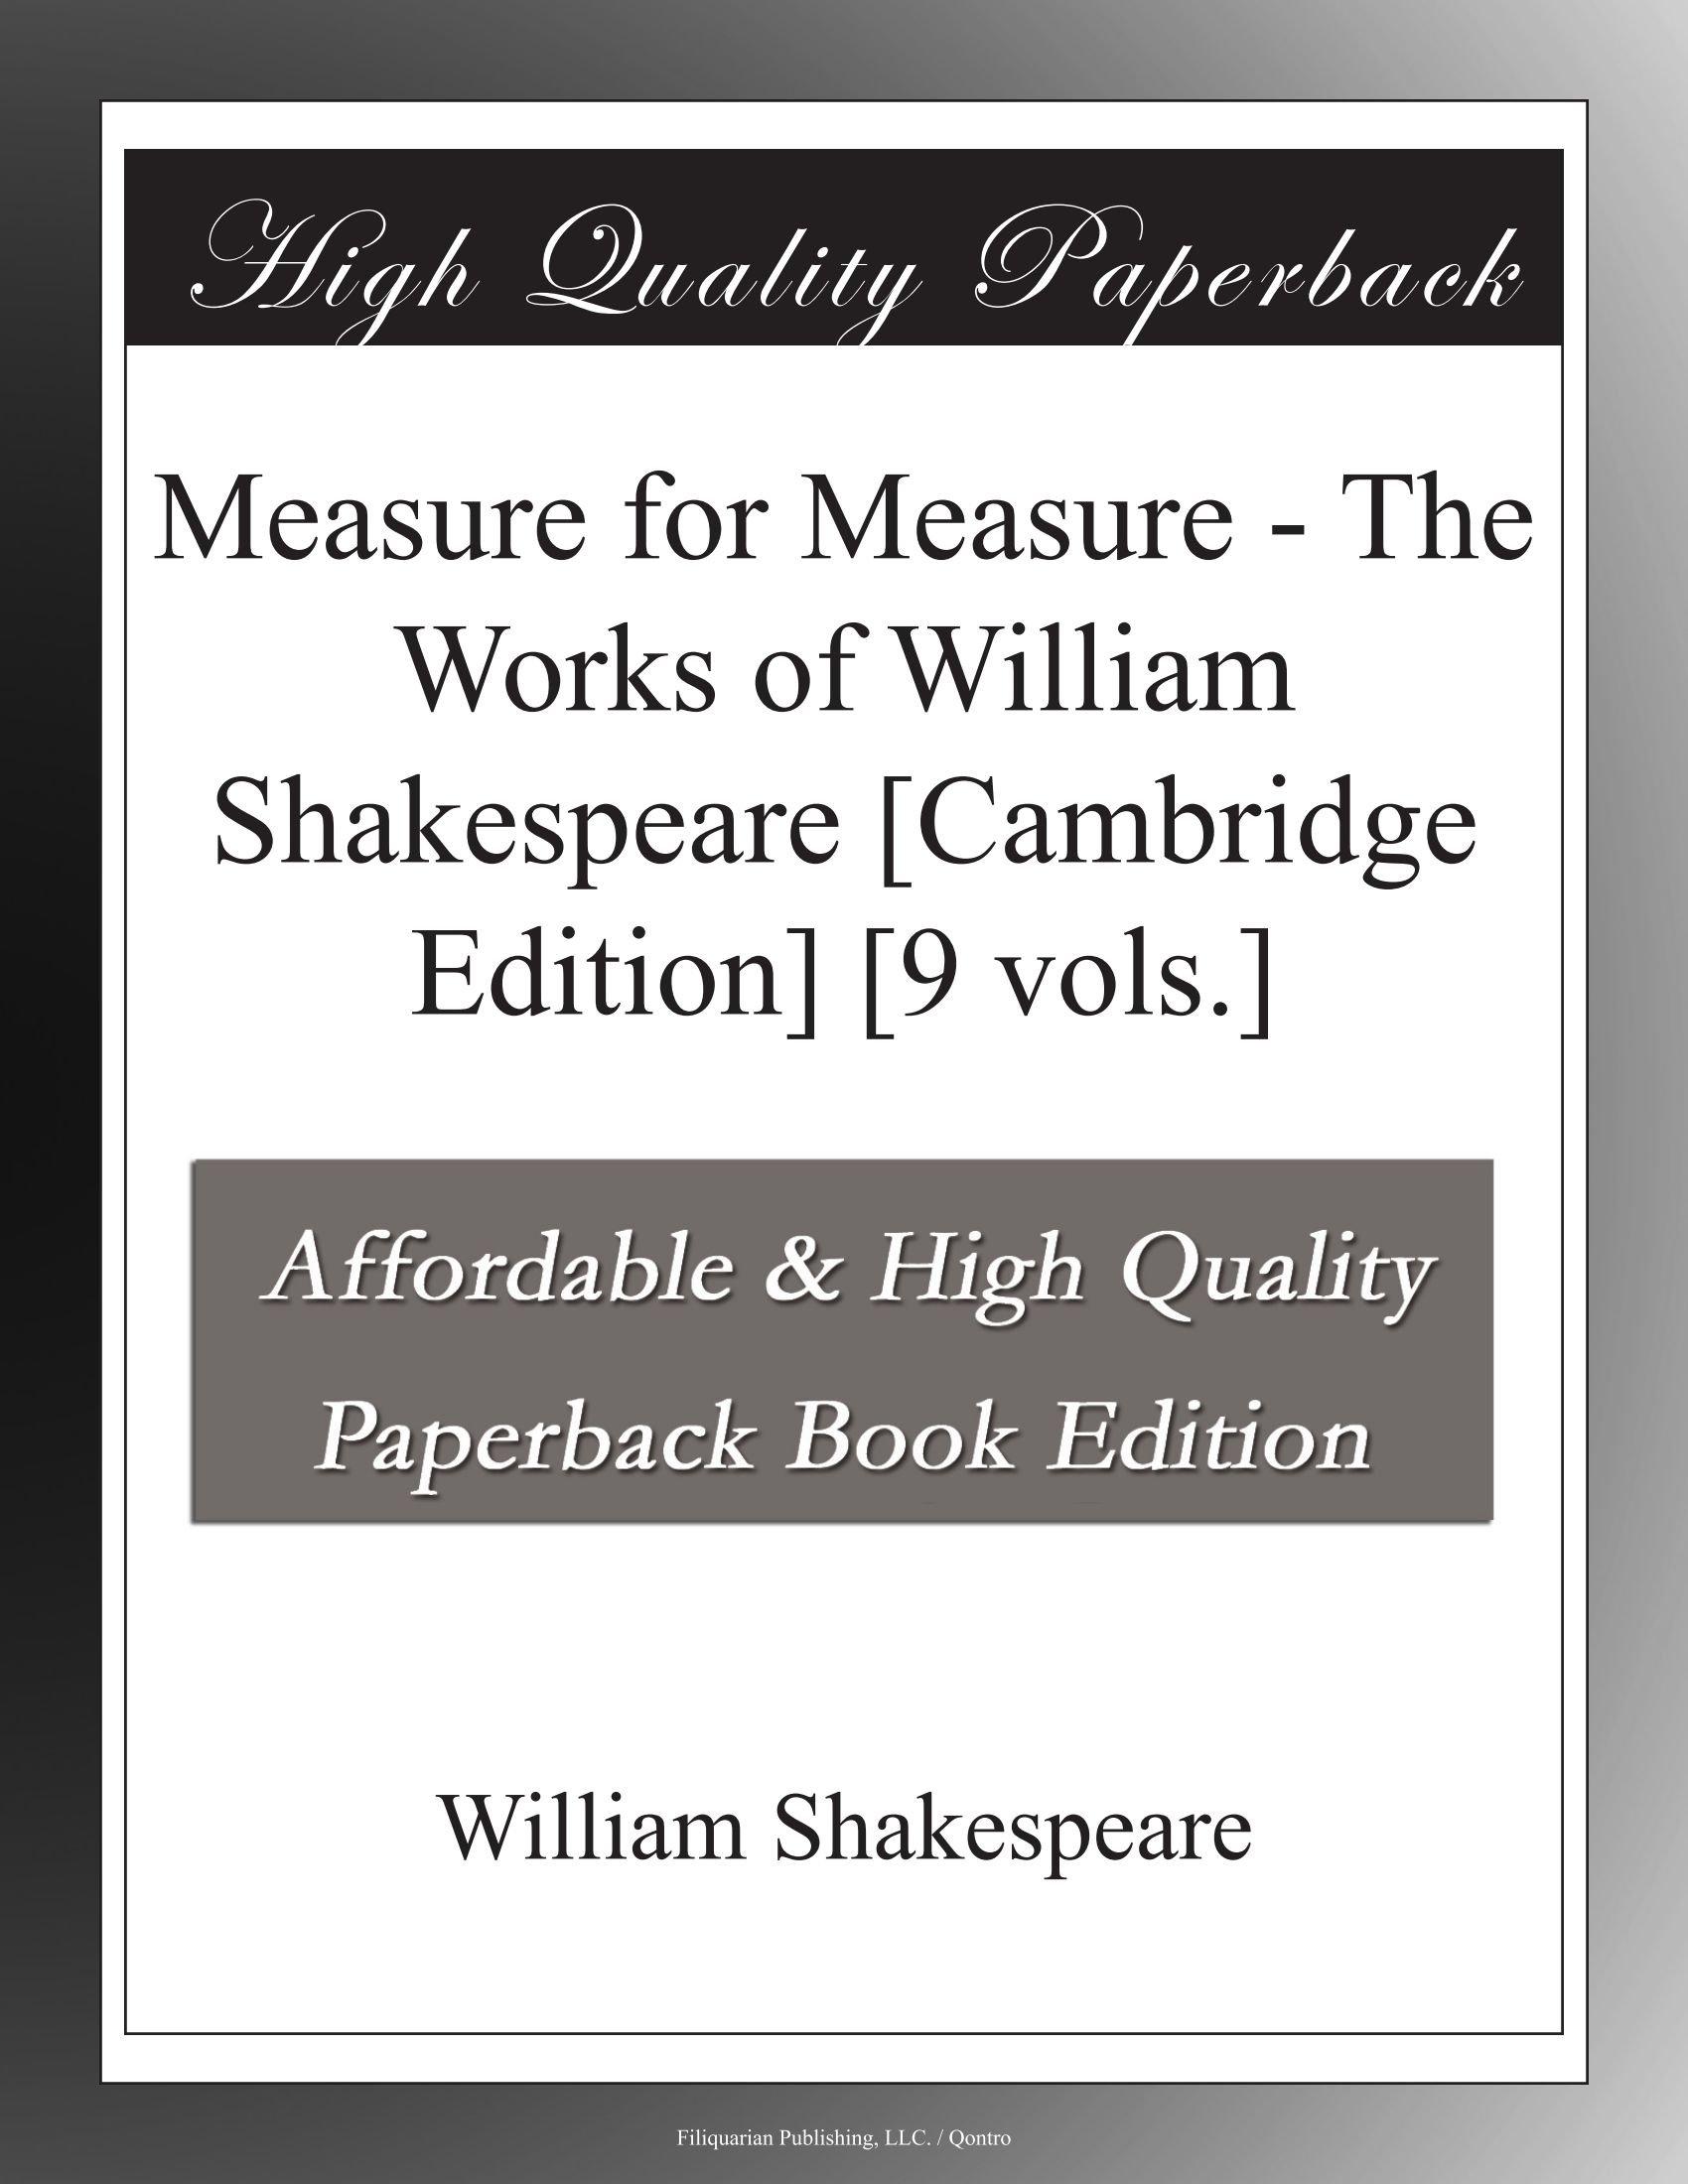 Measure for Measure - The Works of William Shakespeare [Cambridge Edition]  [9 vols.]: William Shakespeare: Amazon.com: Books